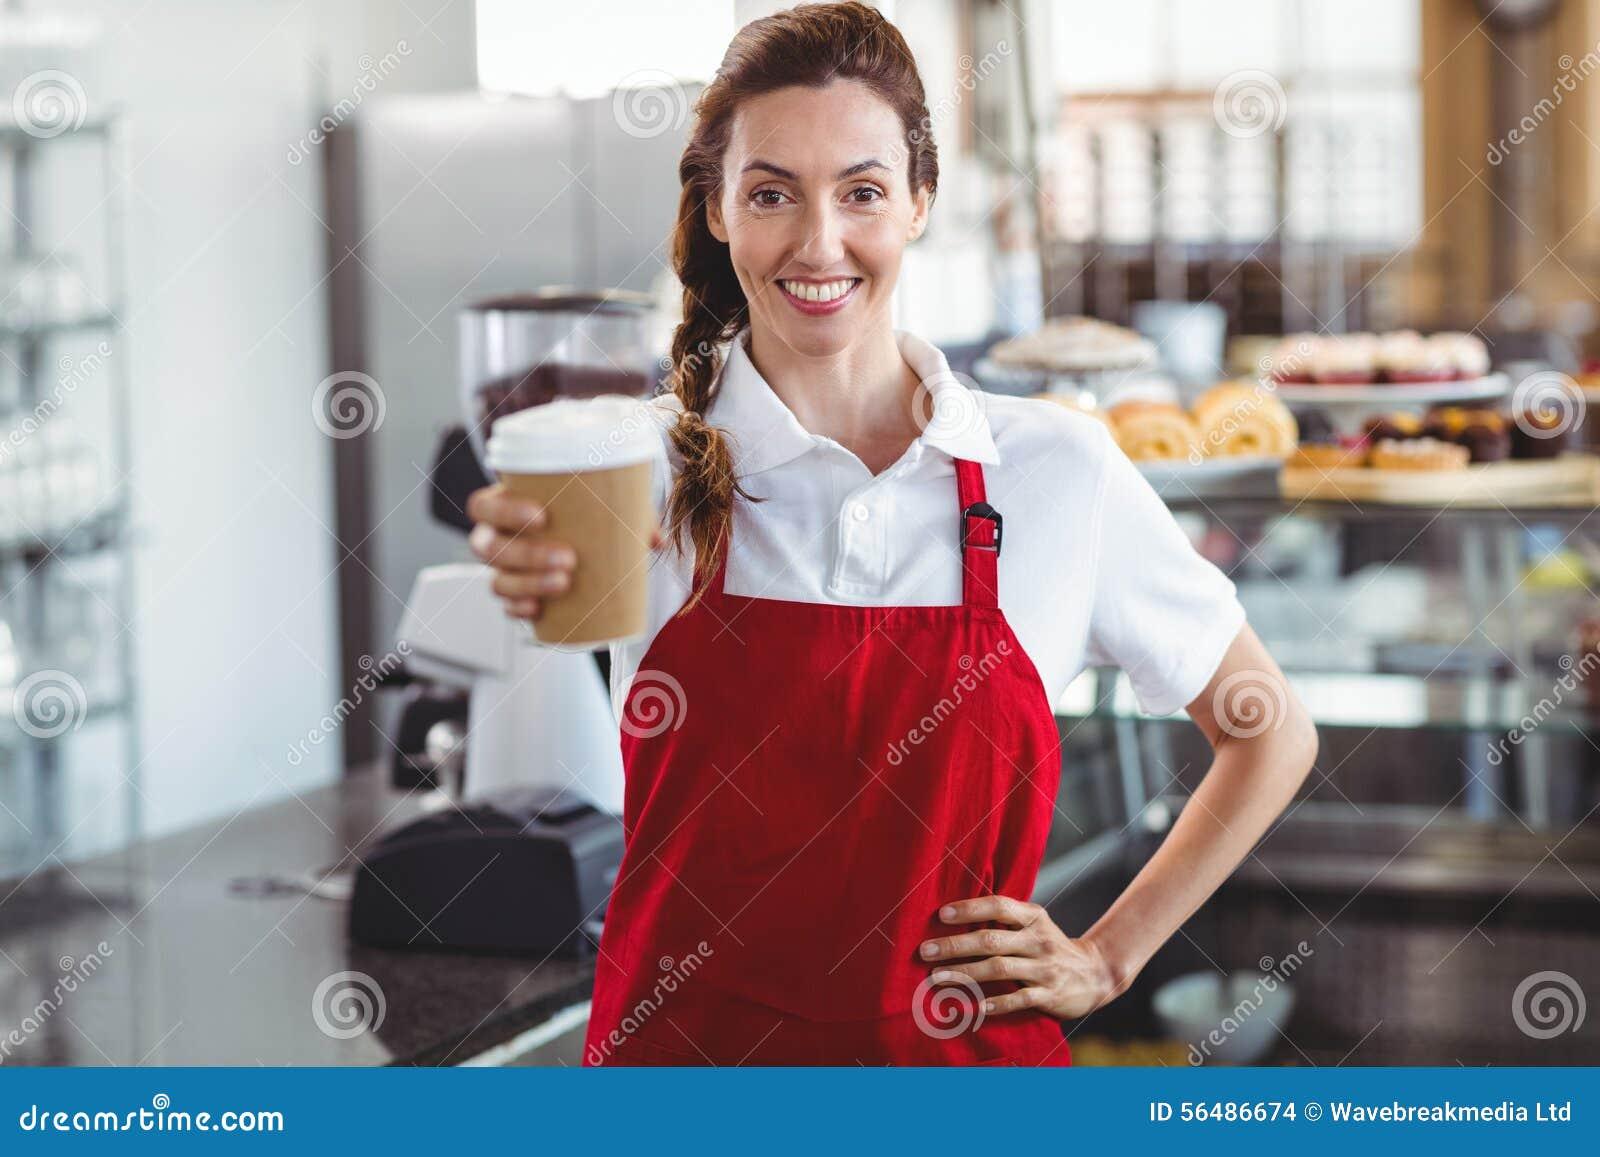 Joli barman donnant la tasse à emporter